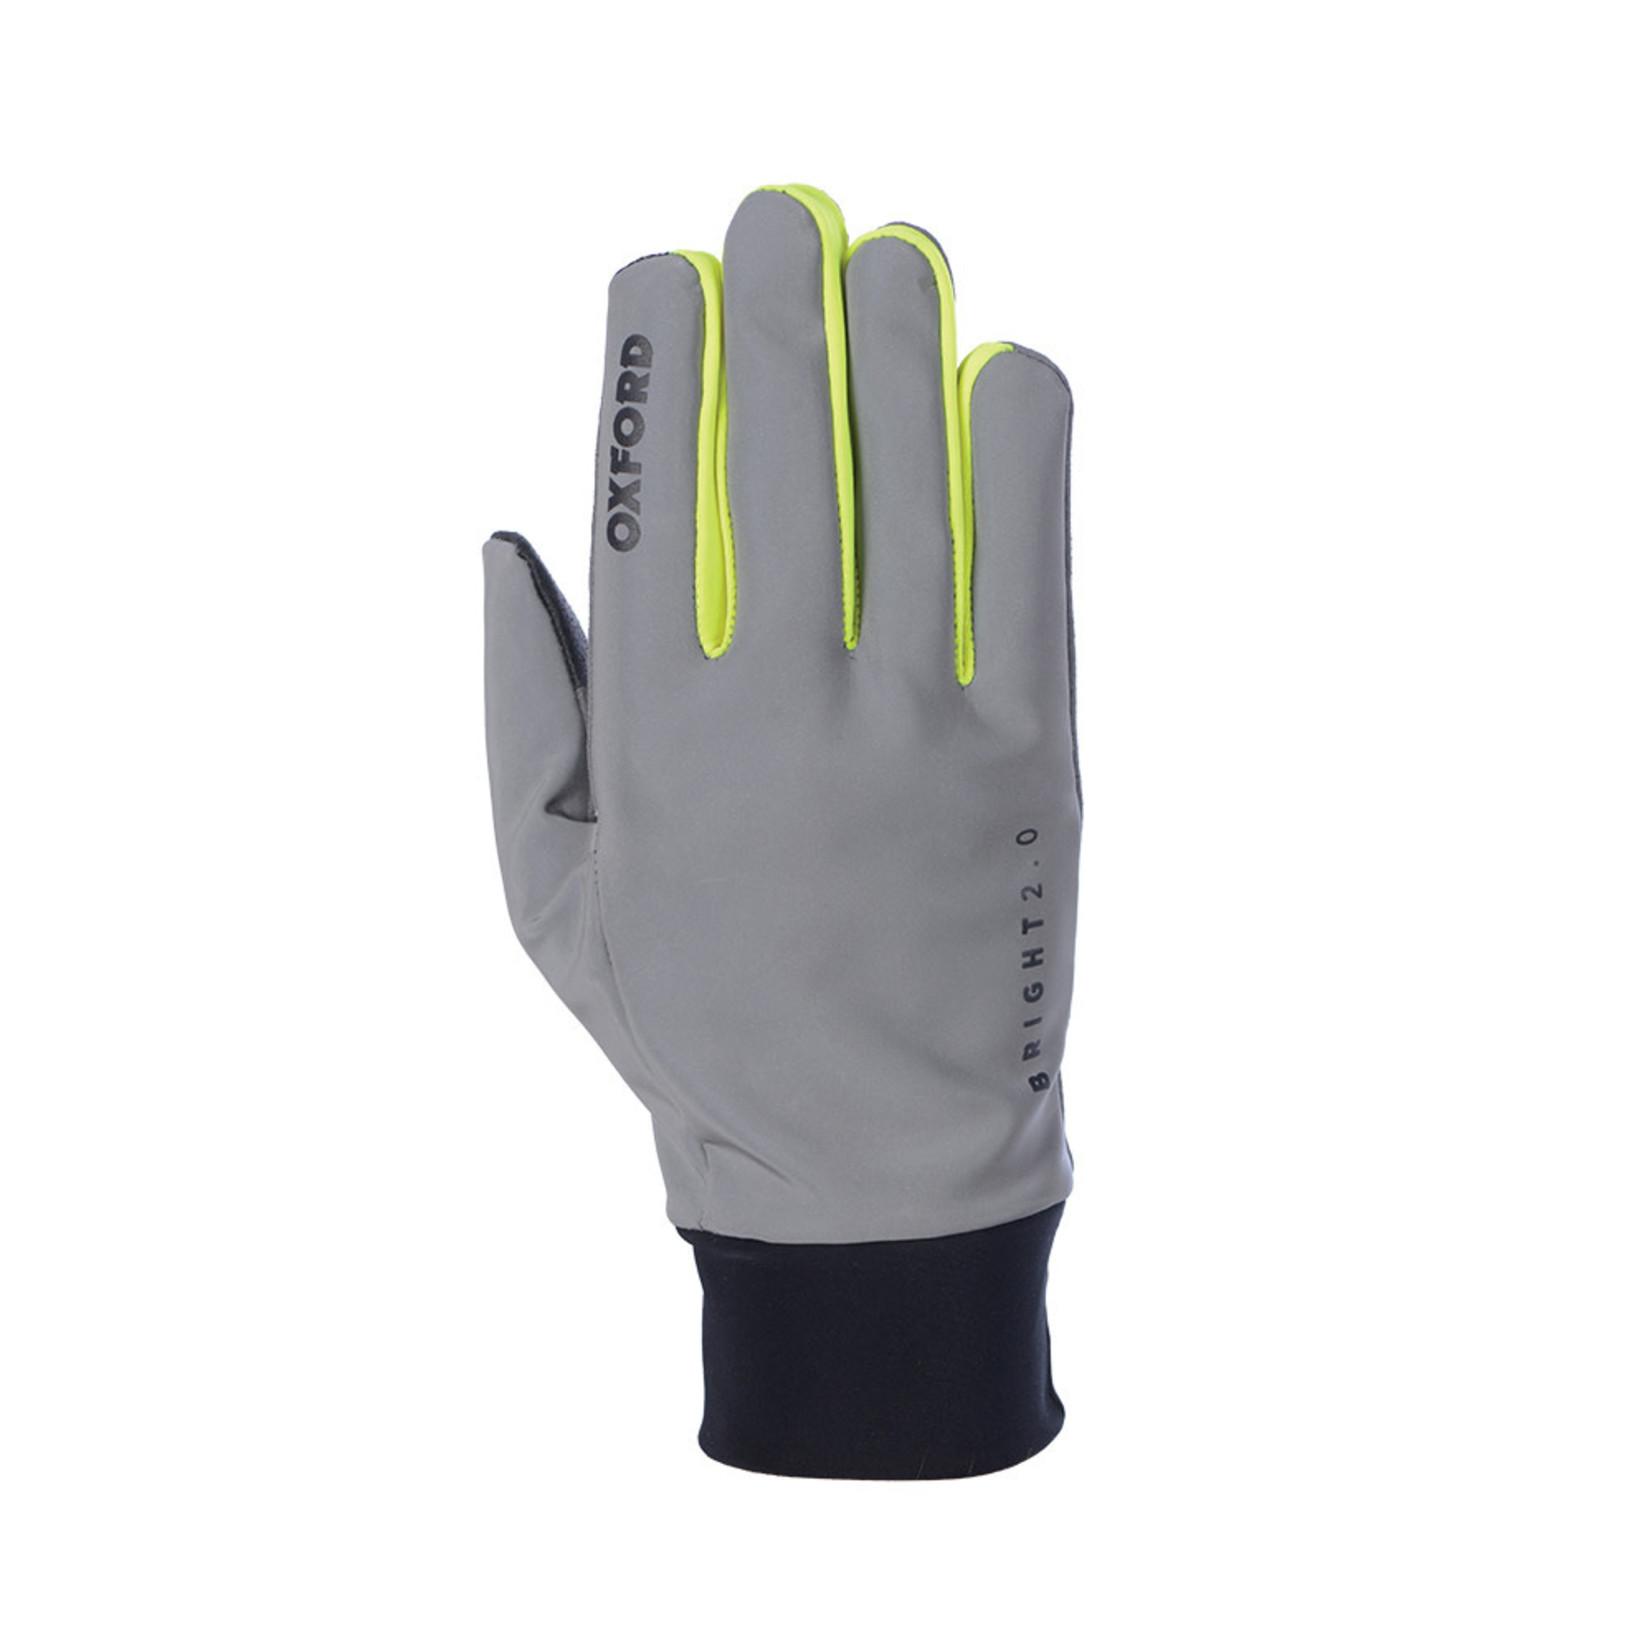 Bright Gloves 2.0 Black